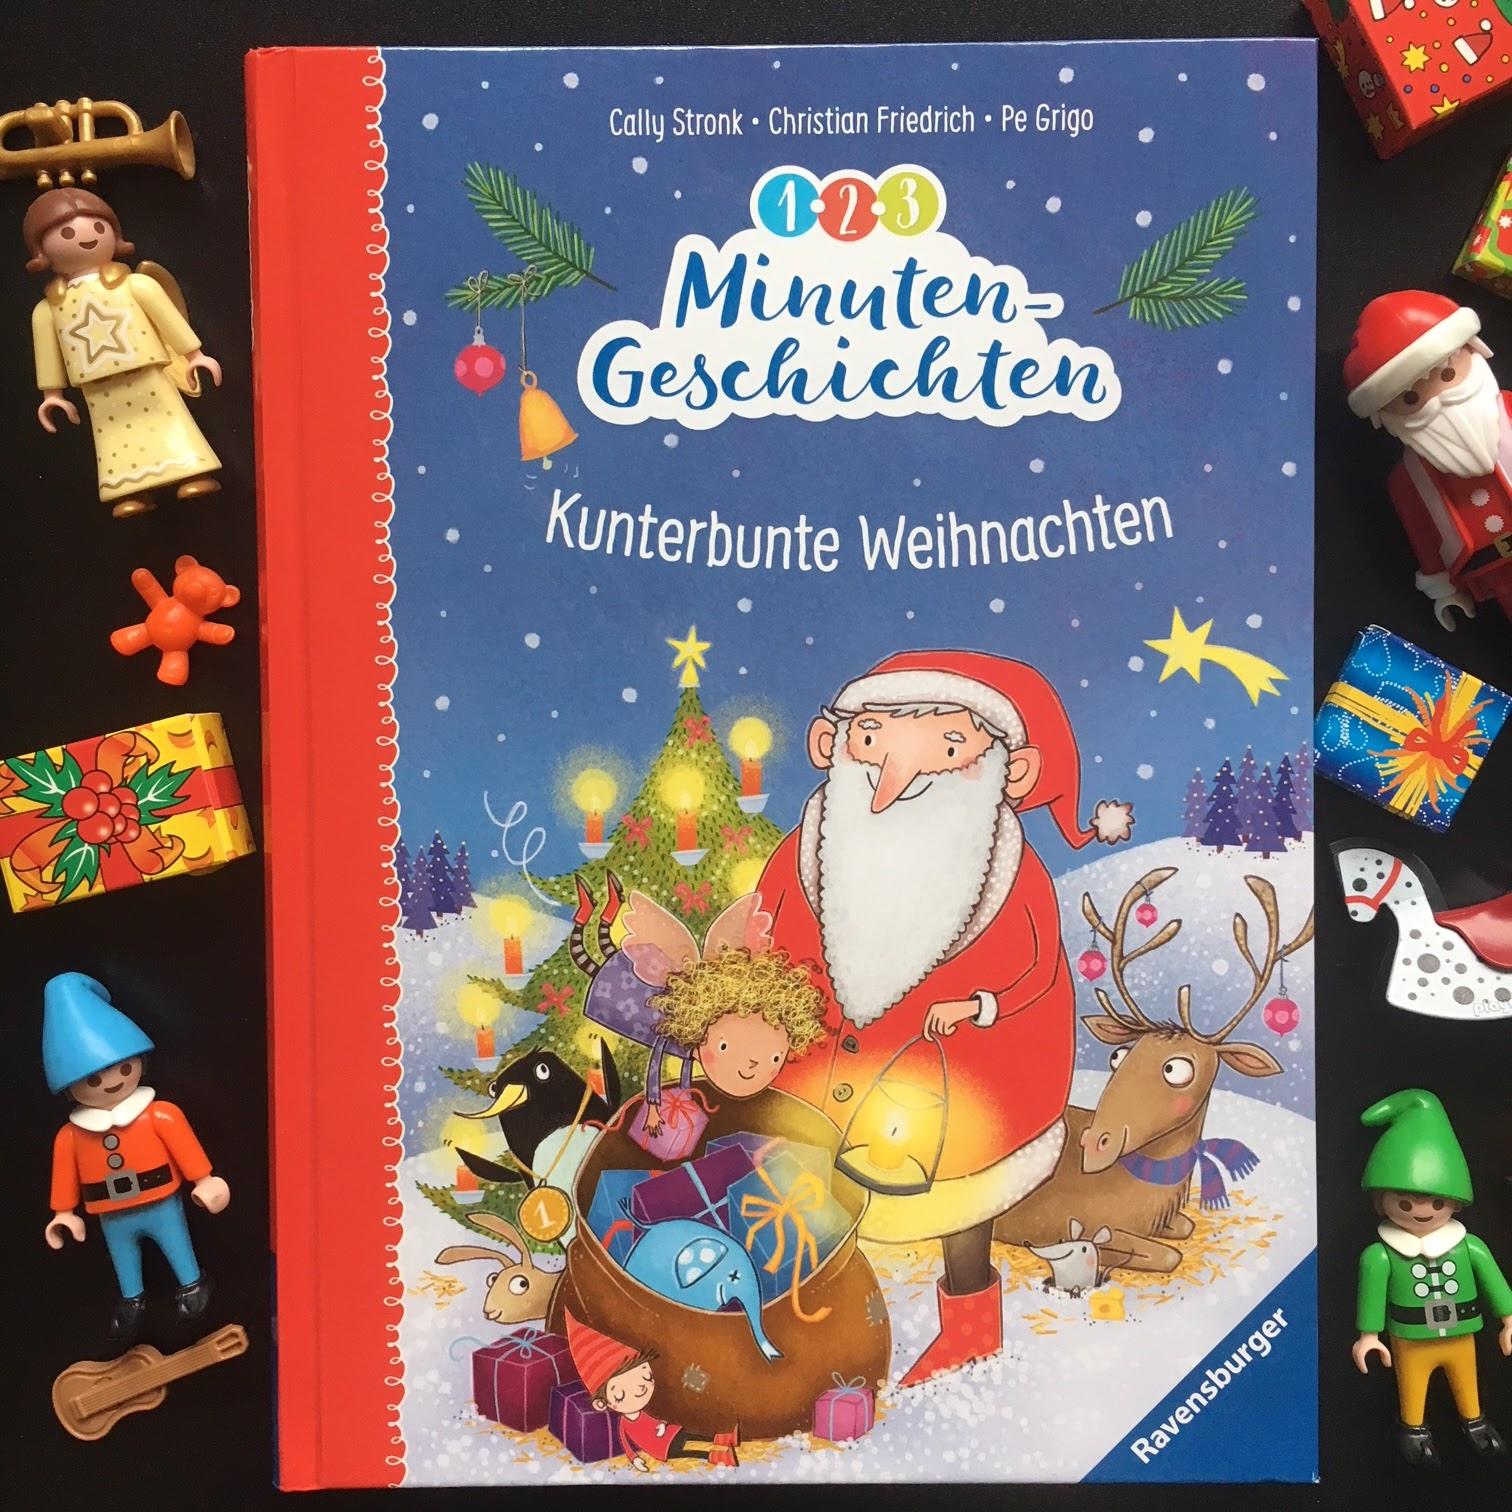 Kinderbuchblog Familienbücherei 1 2 3 Minutengeschichten